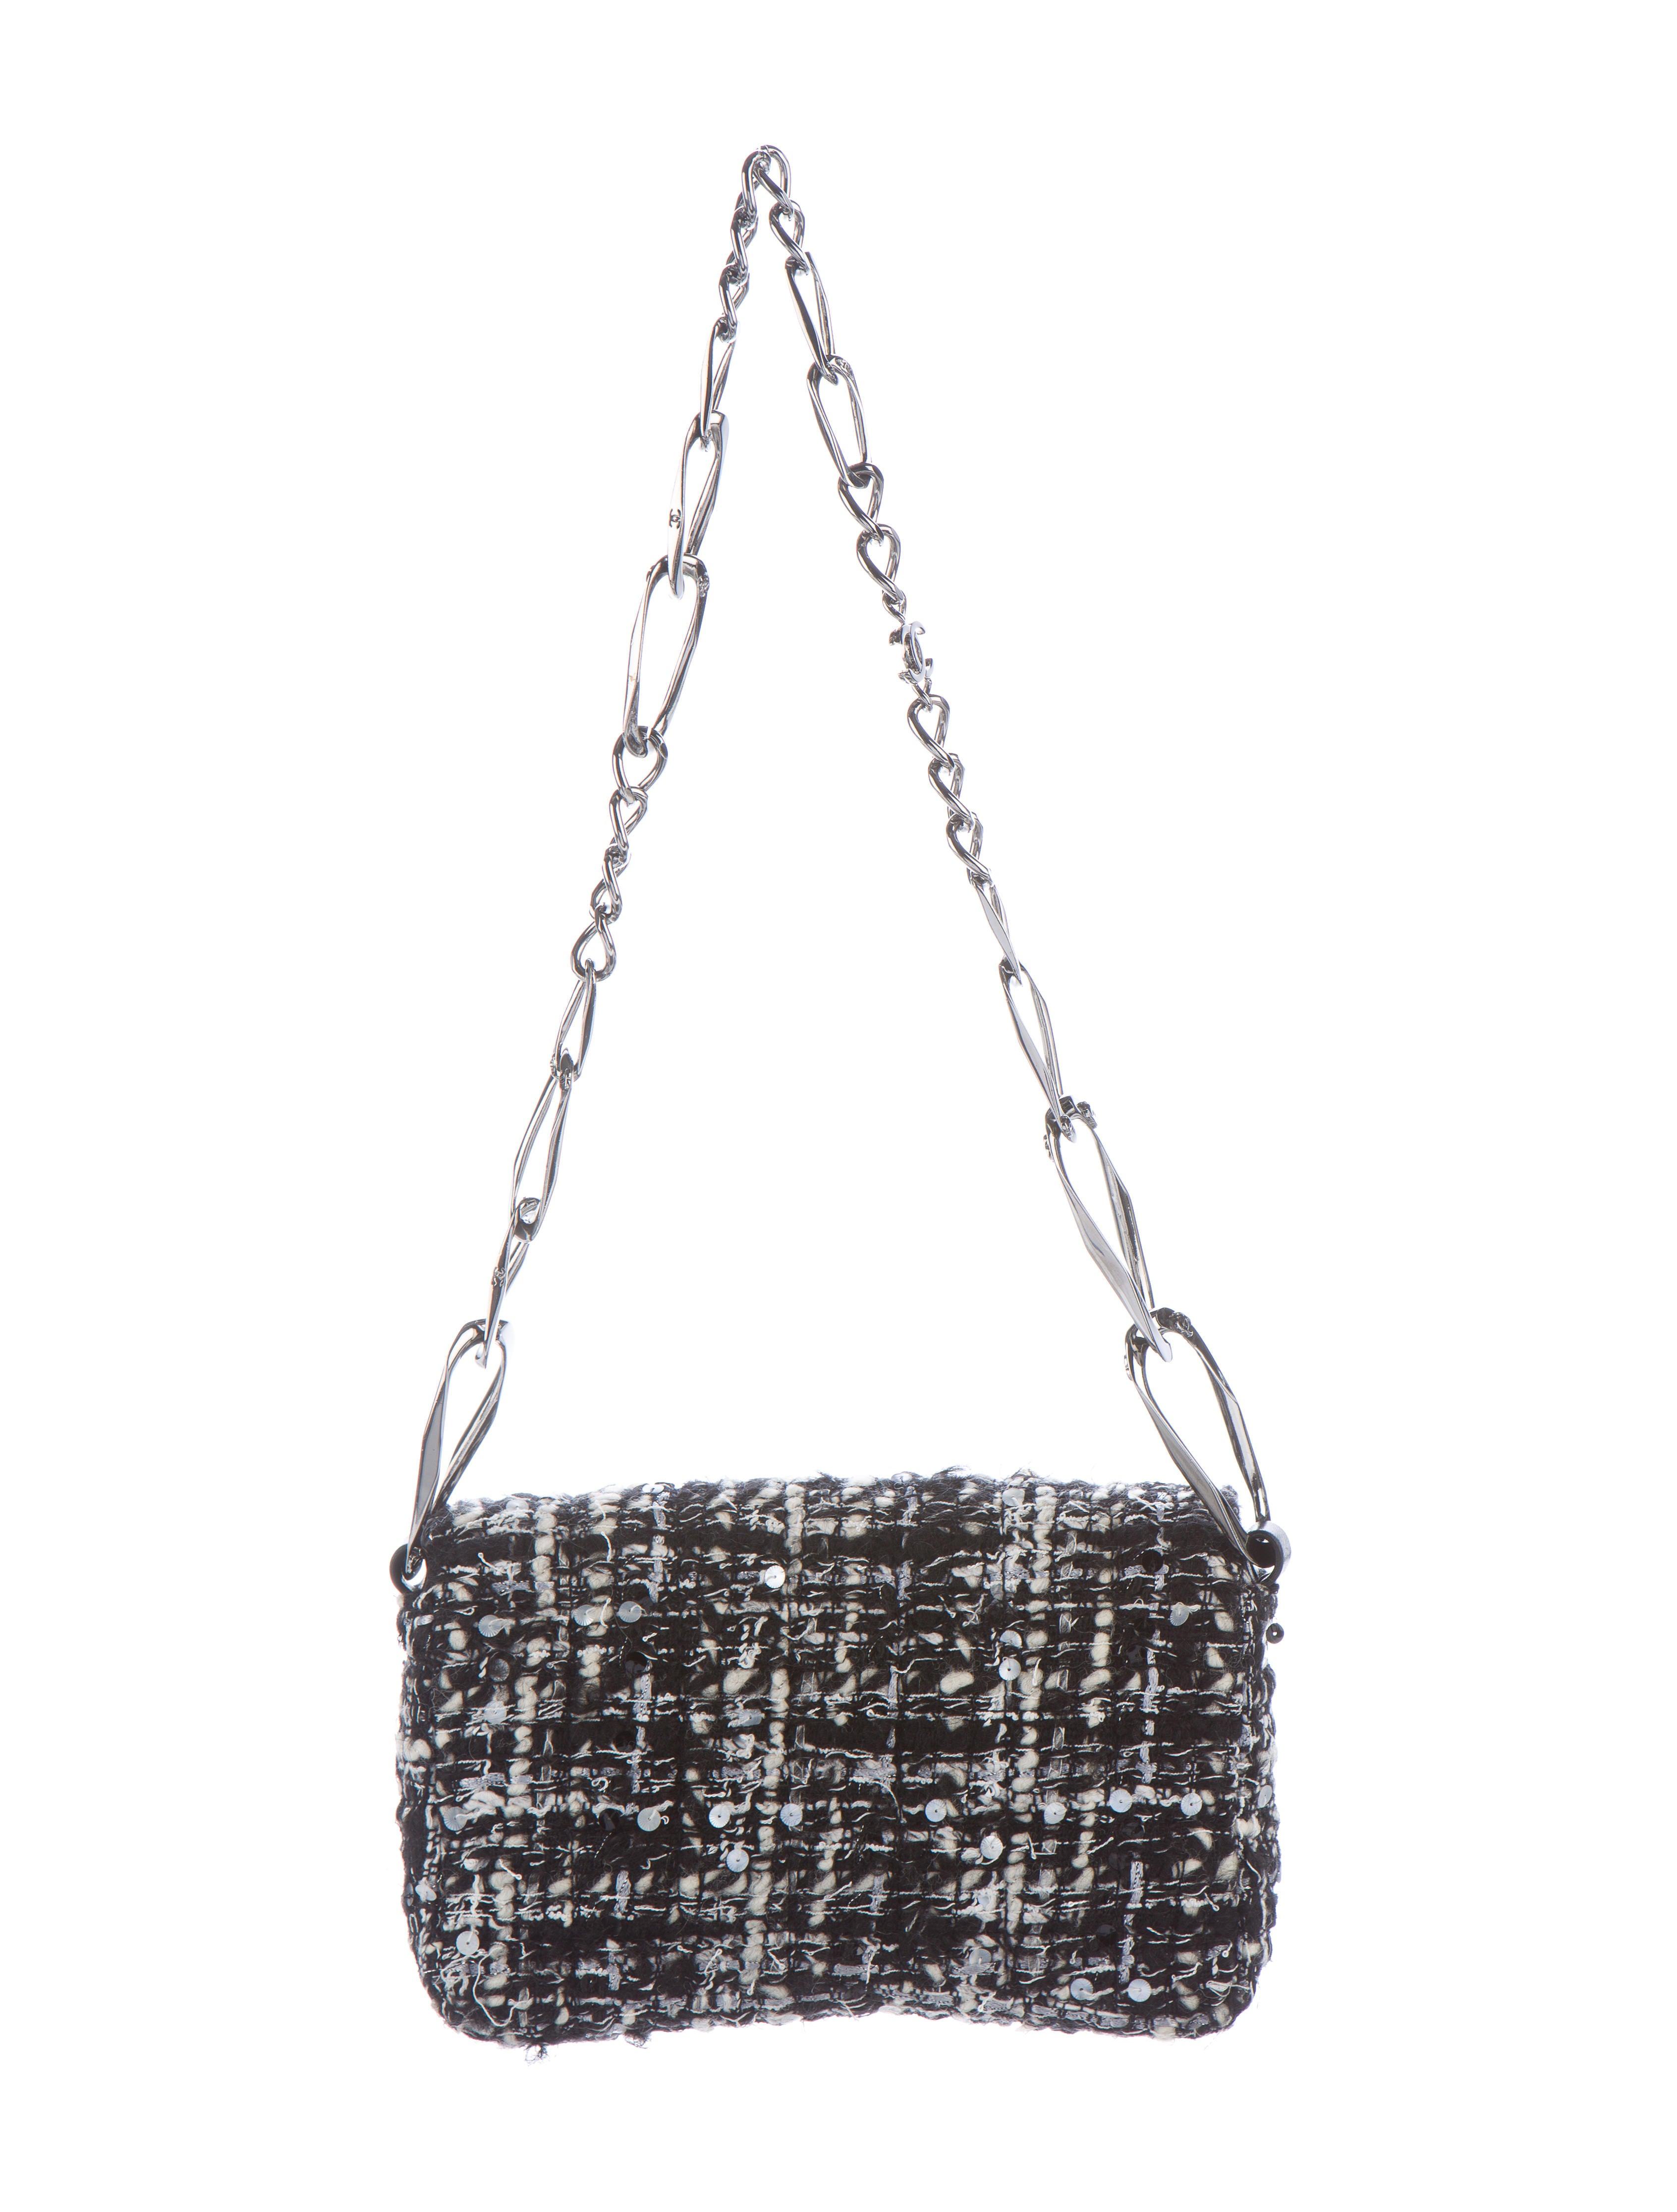 Chanel Tweed Flap Bag Handbags Cha163643 The Realreal